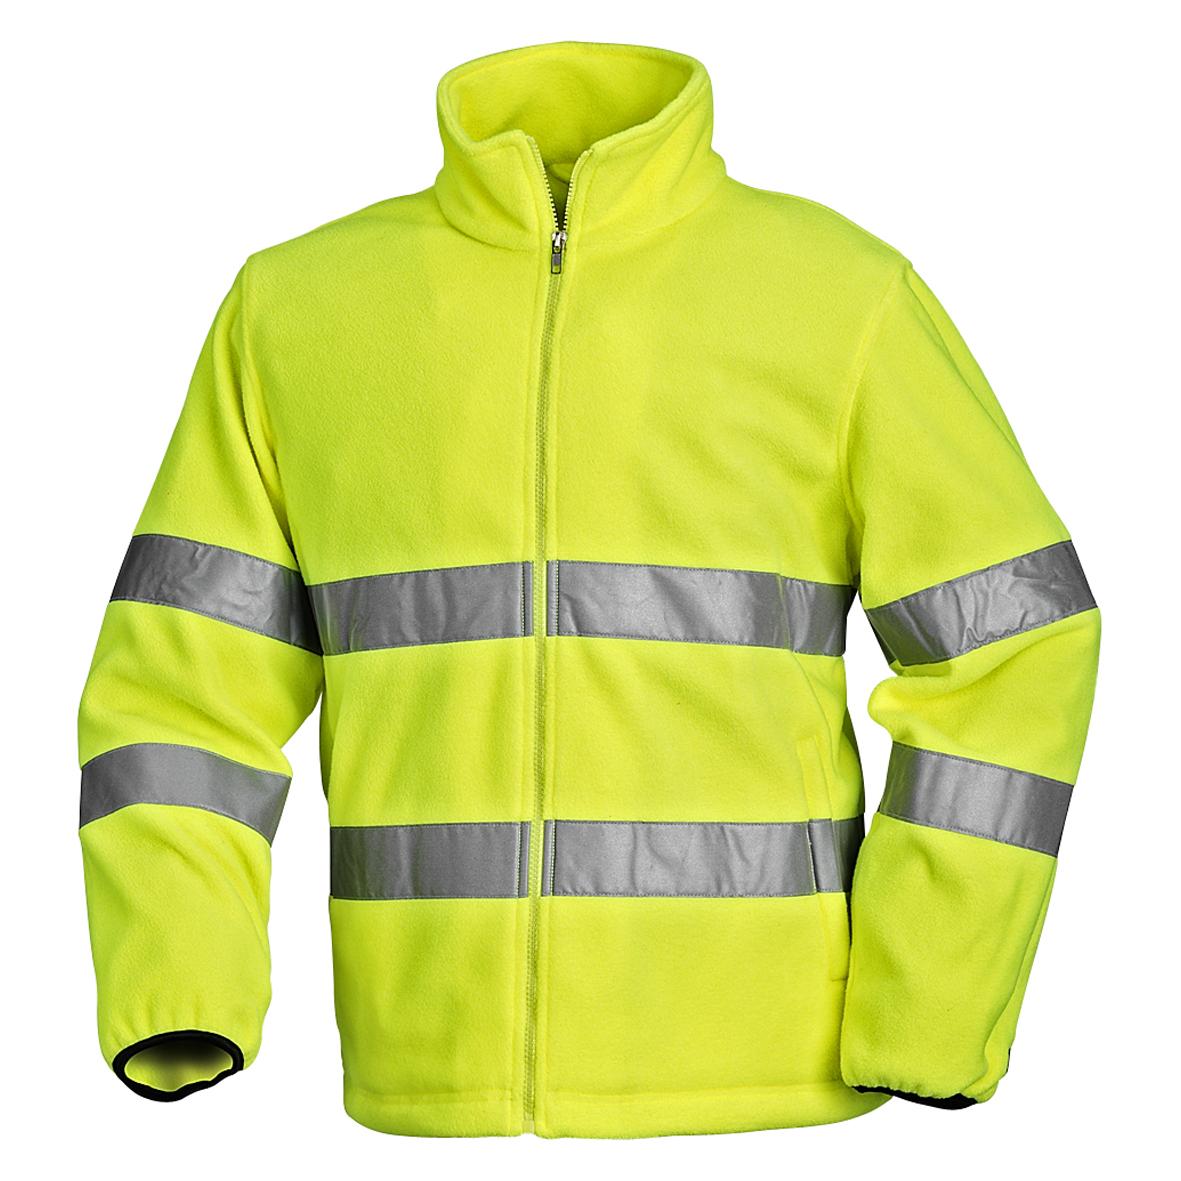 Sheego Damen Sweatjacke Shirtjacke Jacke Gr 40 bis 56 Zipel NEU 238